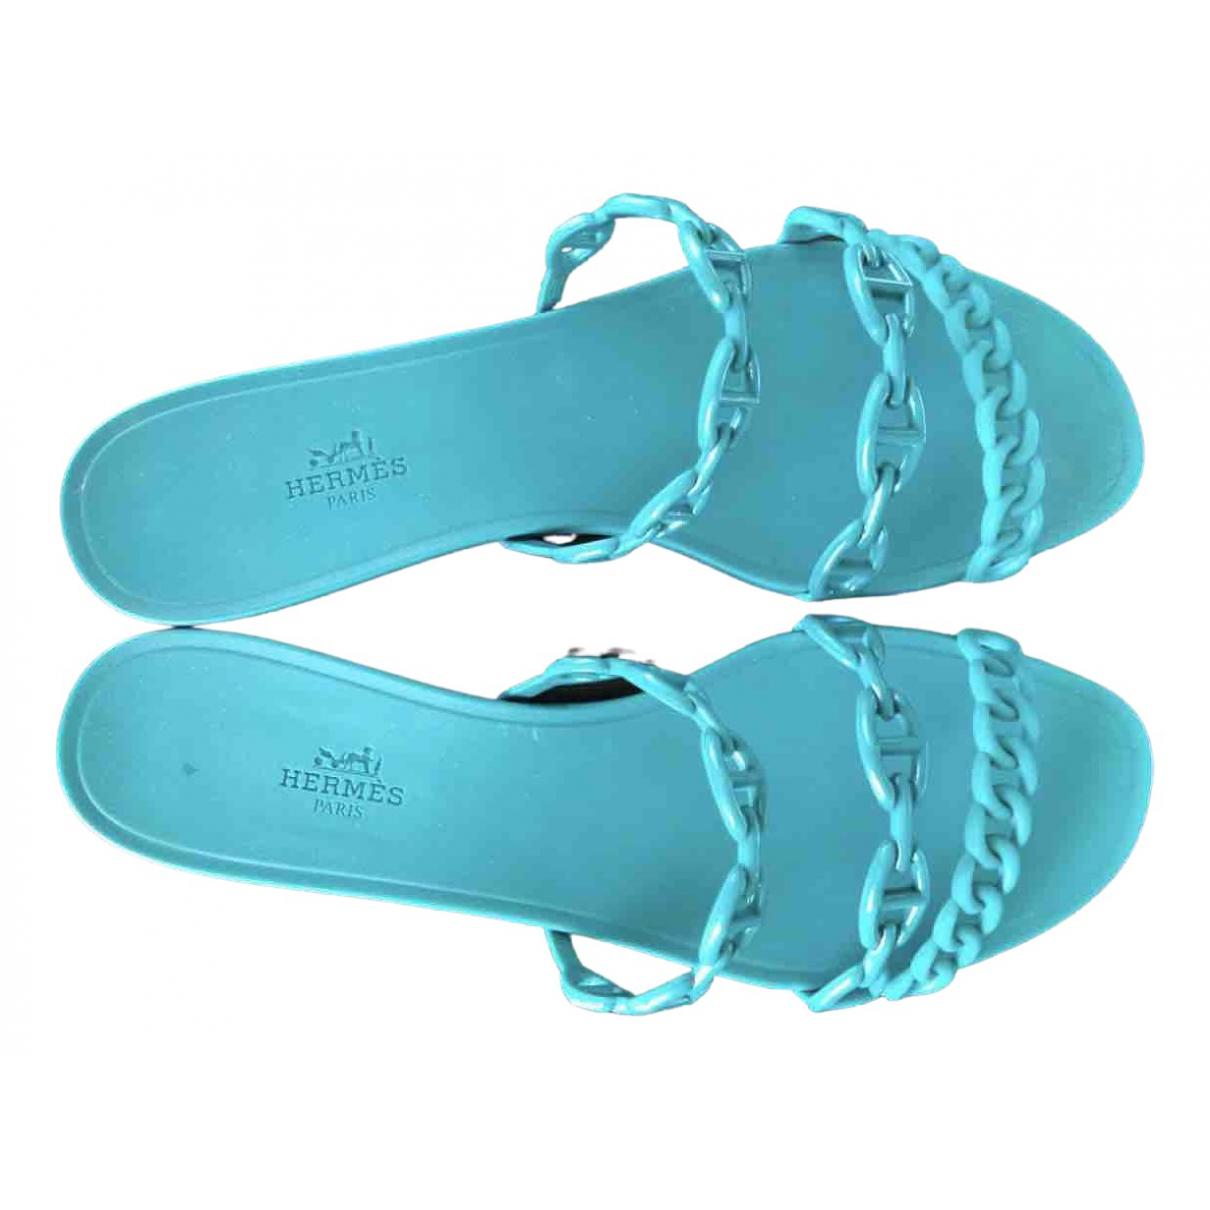 Hermès Nude Turquoise Rubber Sandals for Women 41 EU